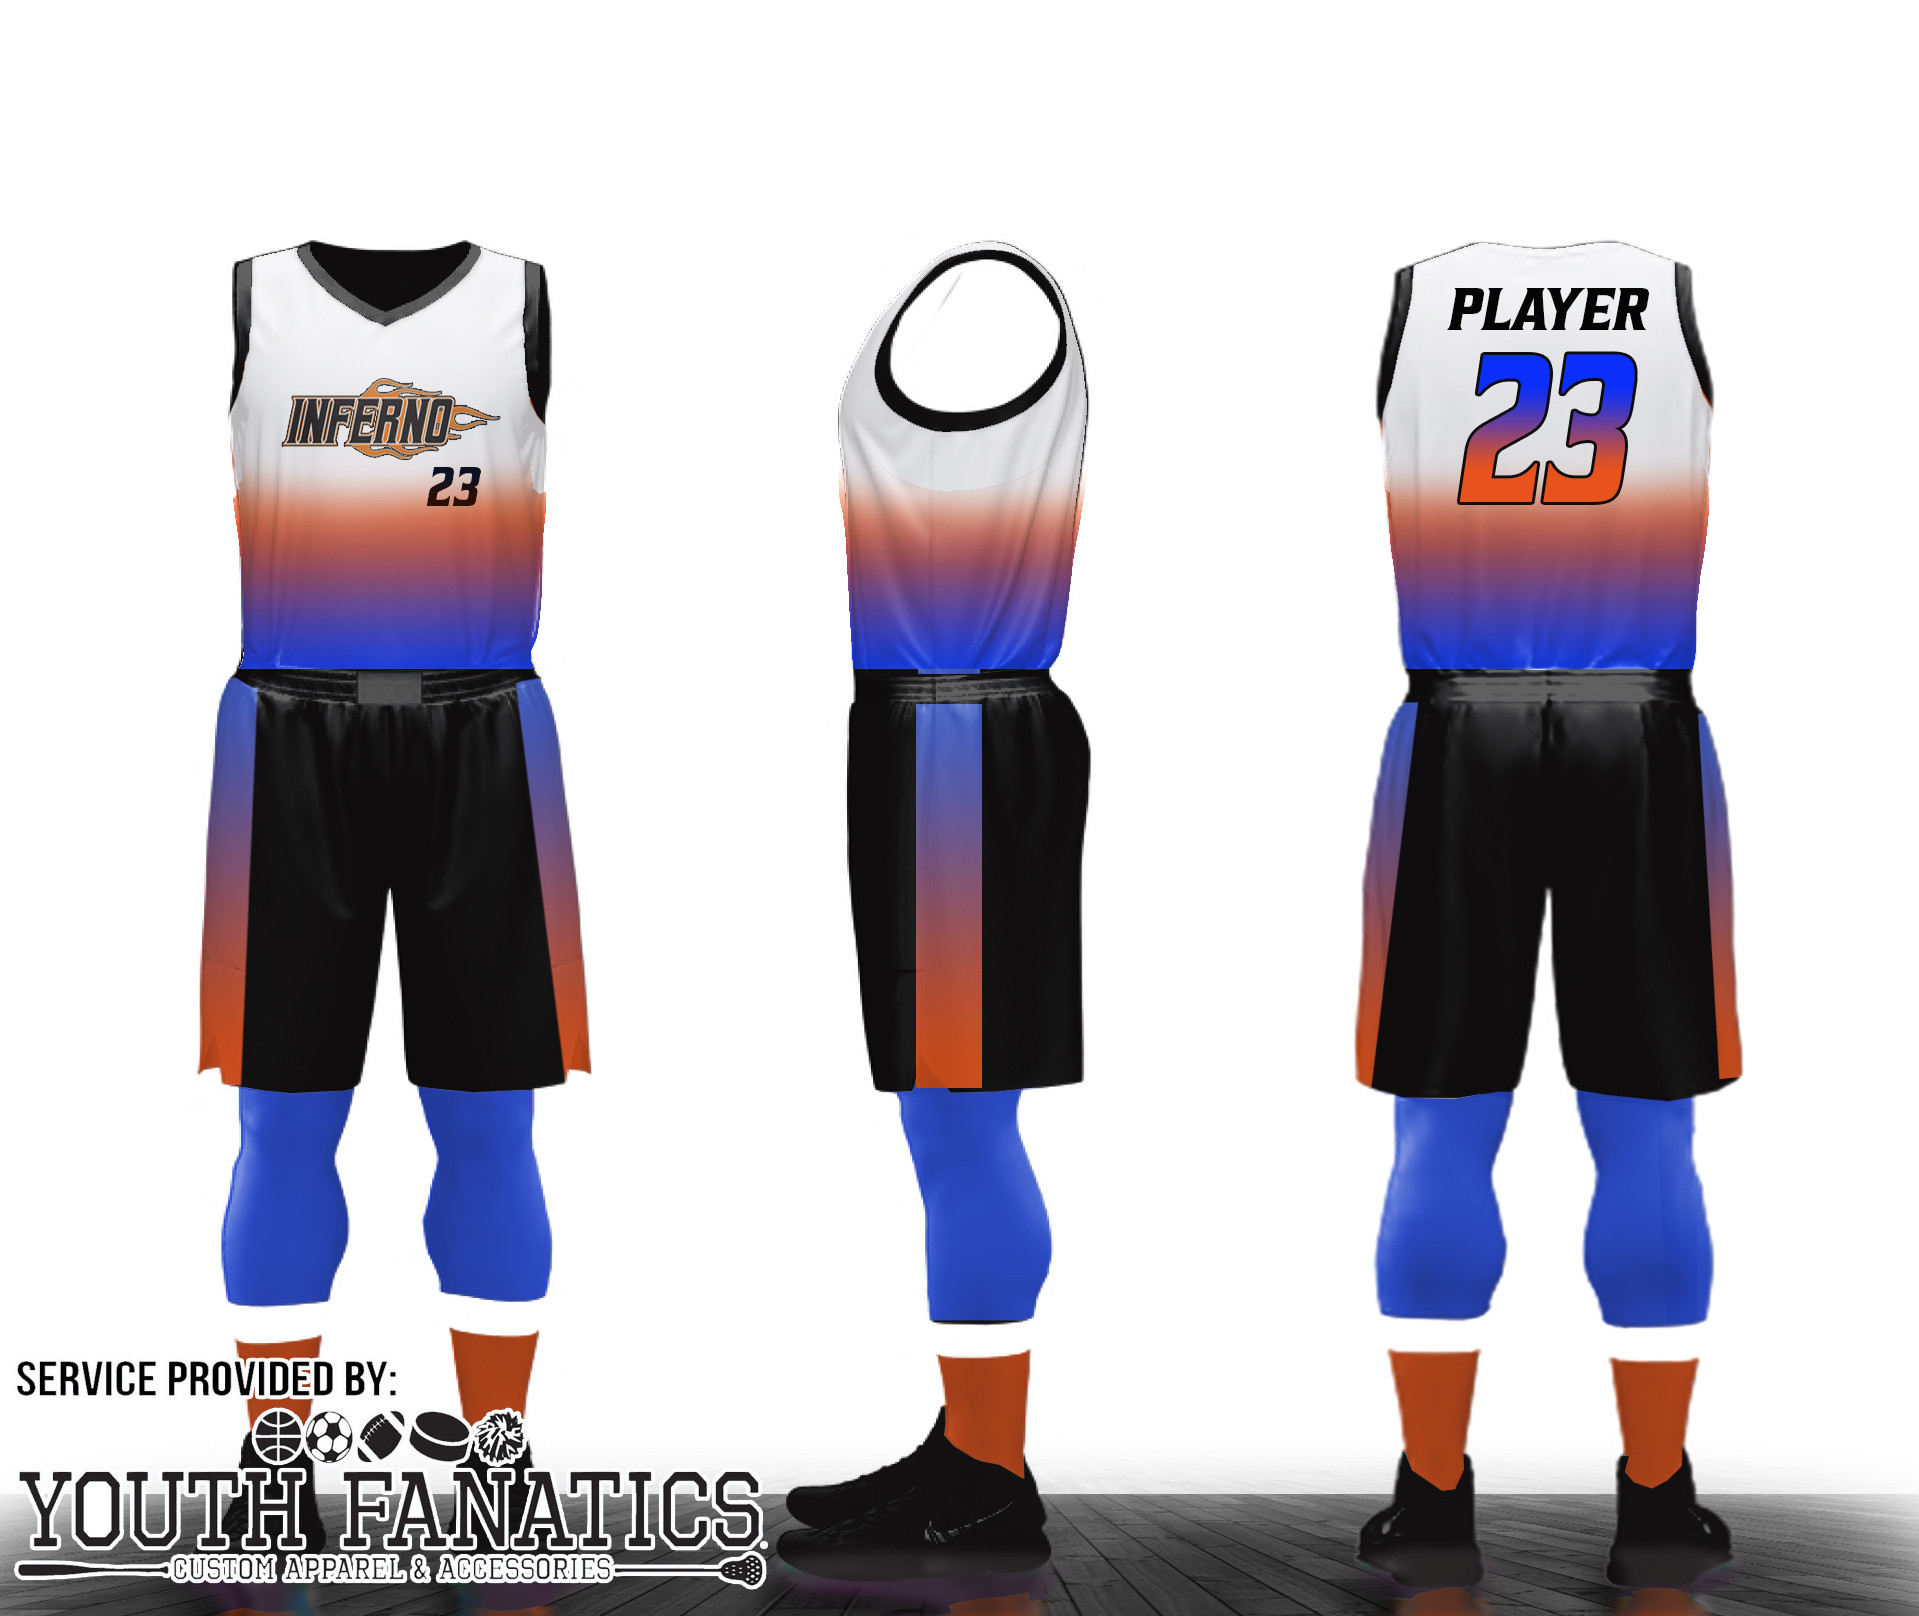 Inferno Custom Basketball Uniform mockup